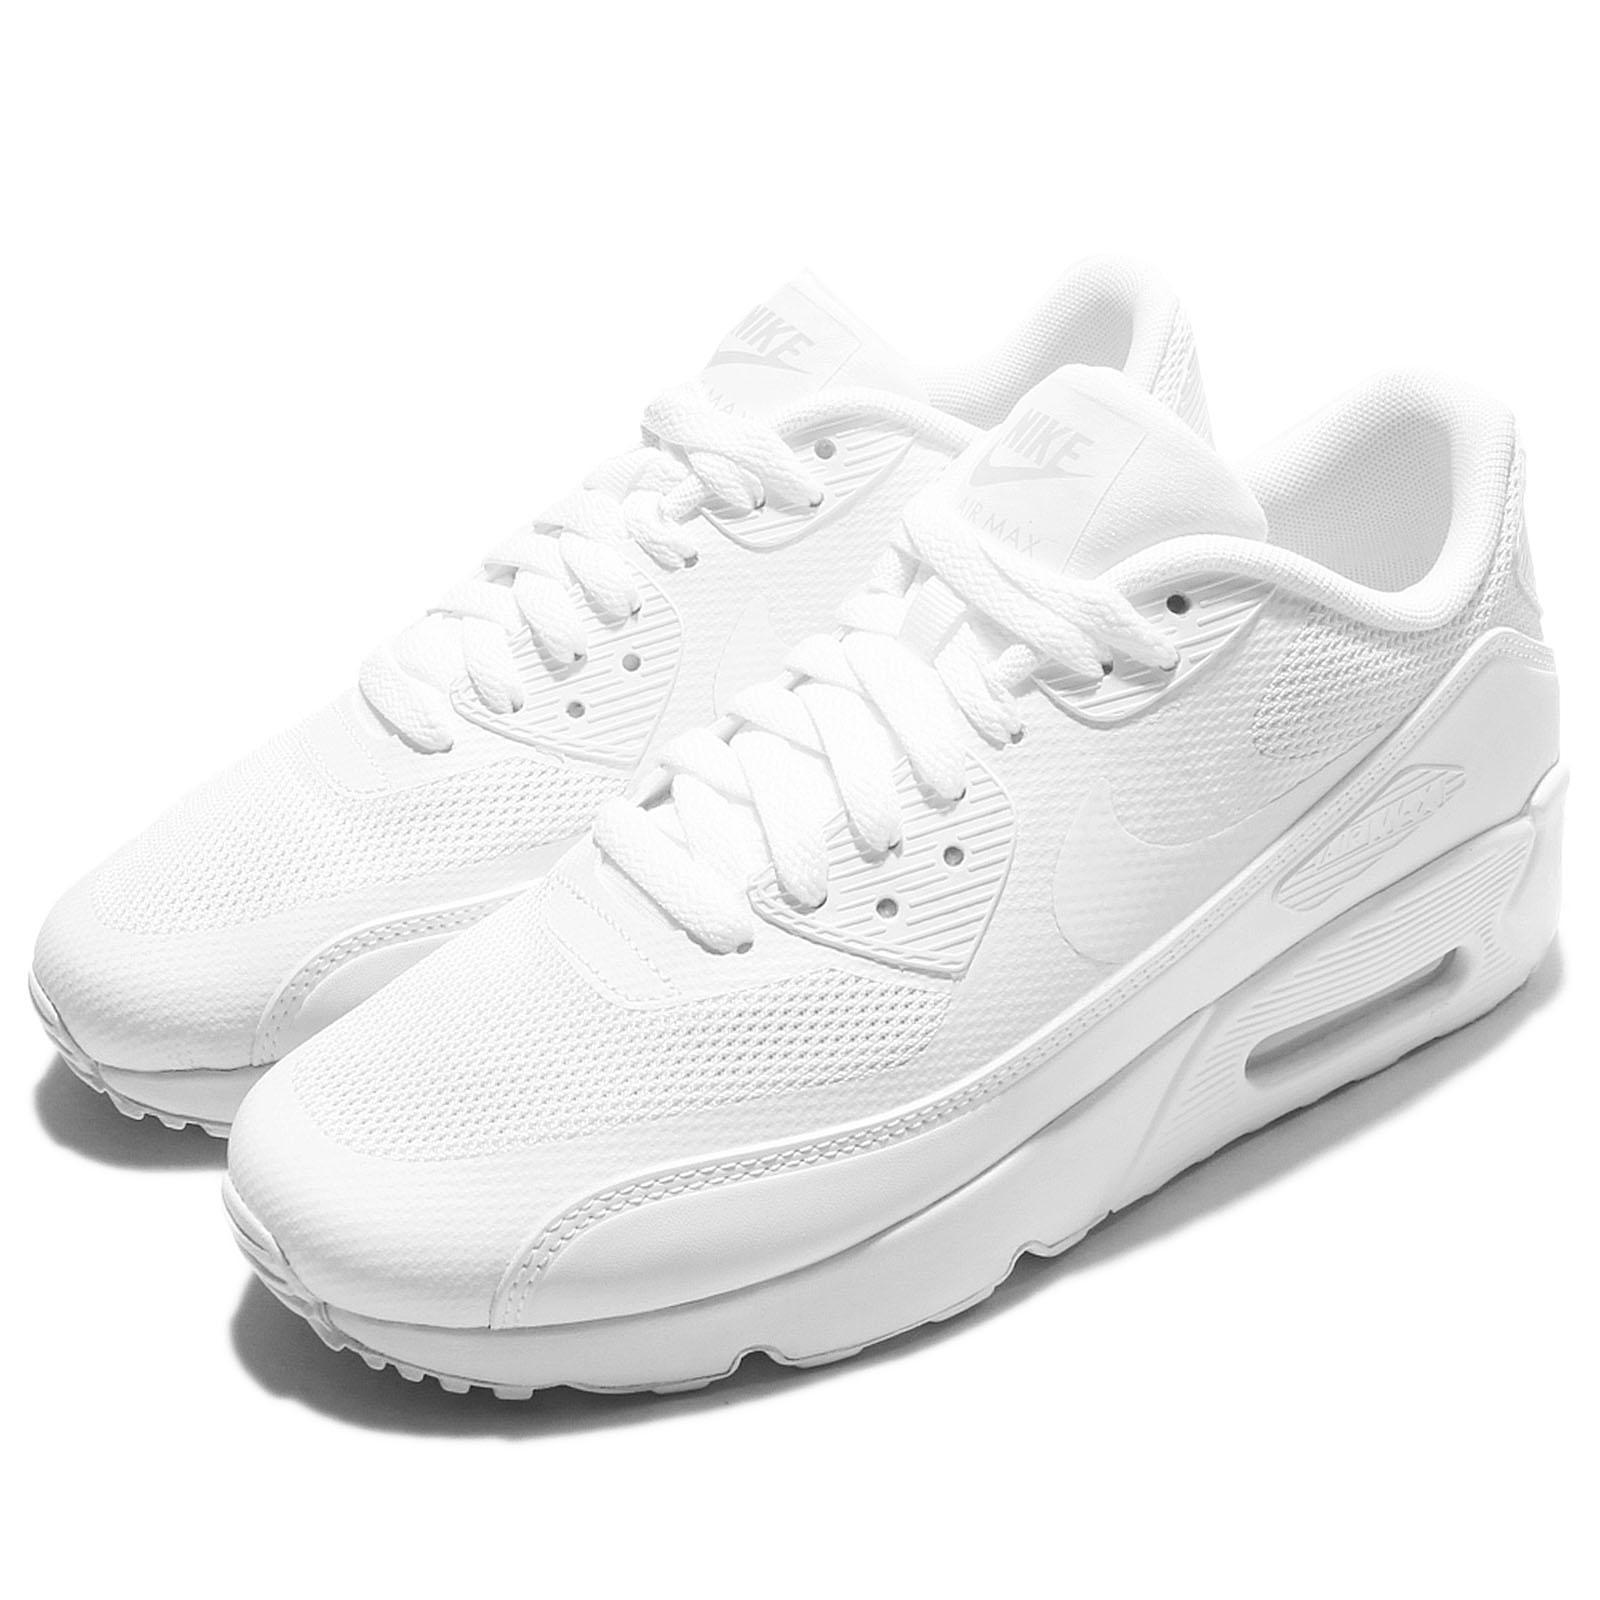 bb26c5de2ab Details about Nike Air Max 90 Ultra 2.0 GS Triple White Kid Women Running  Shoes 869950-100